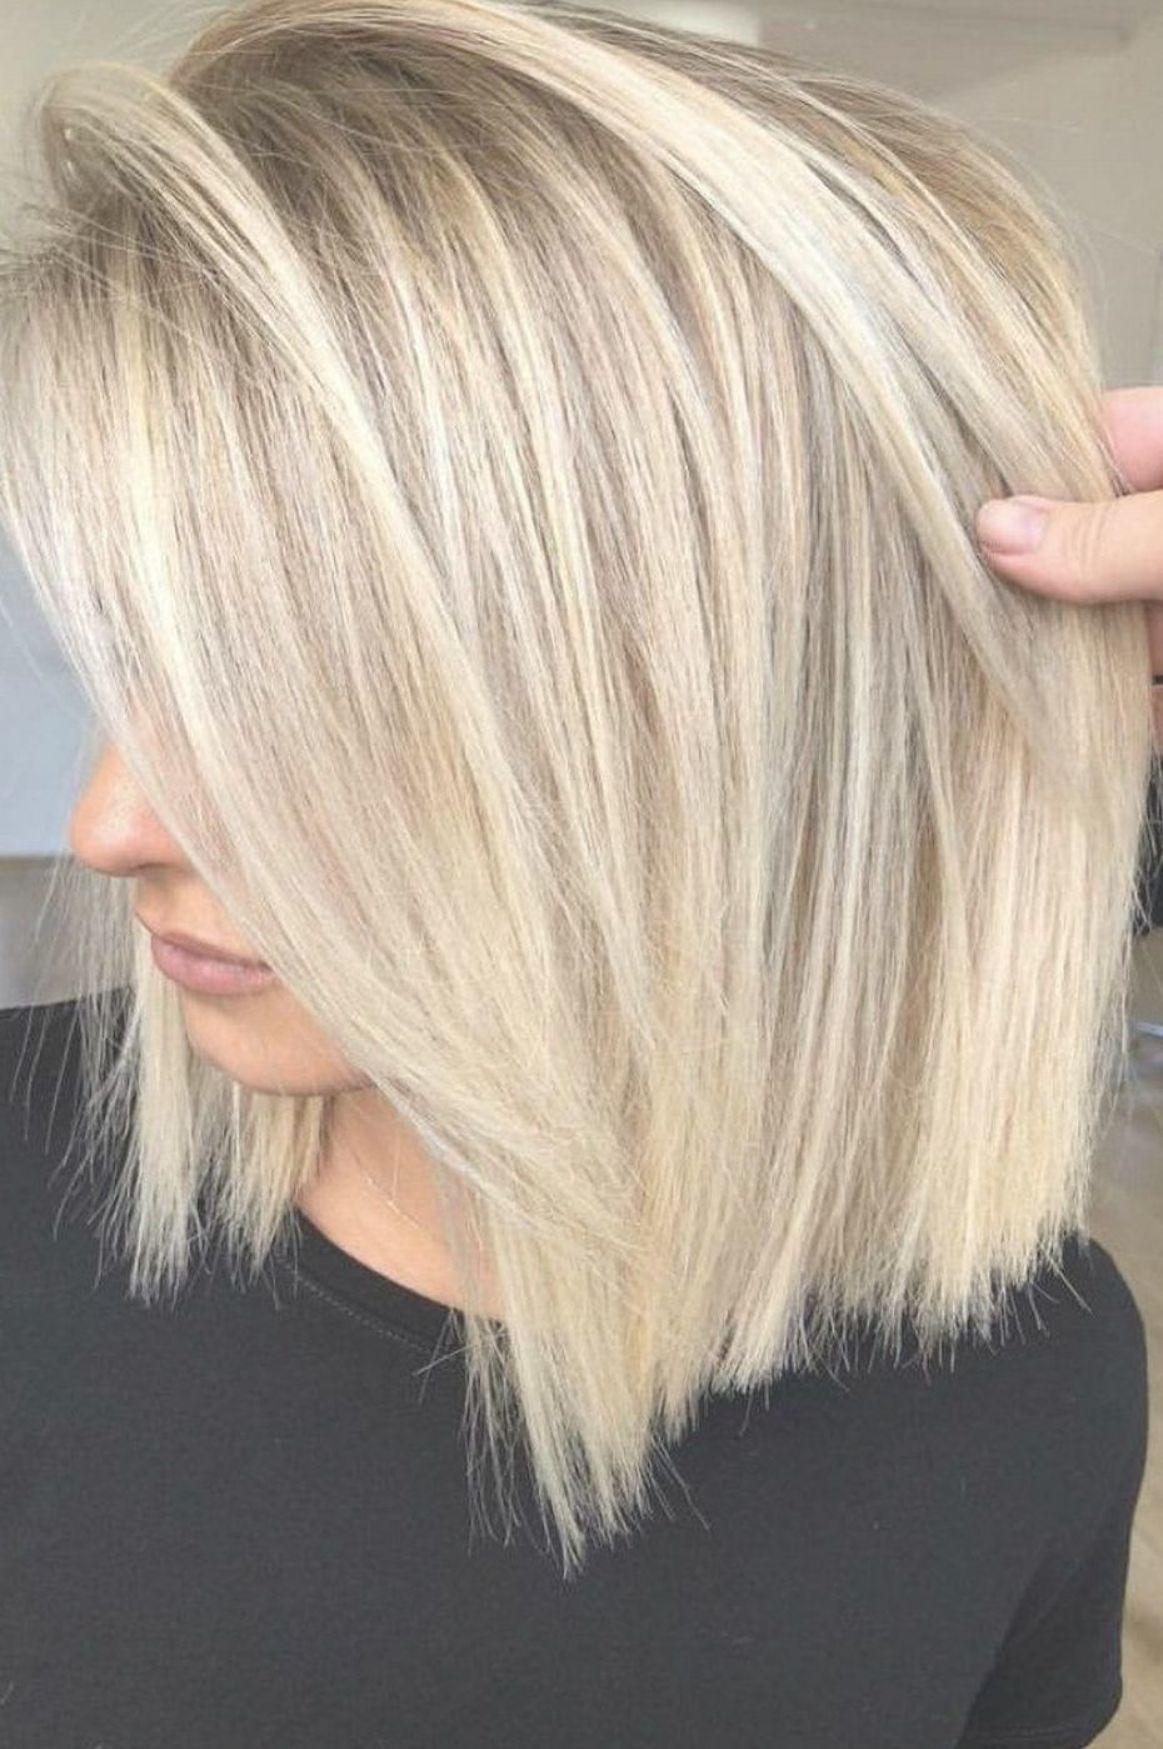 Pin By Sabrina On Hair In 2020 Hair Styles Straight Blonde Hair Hair Lengths